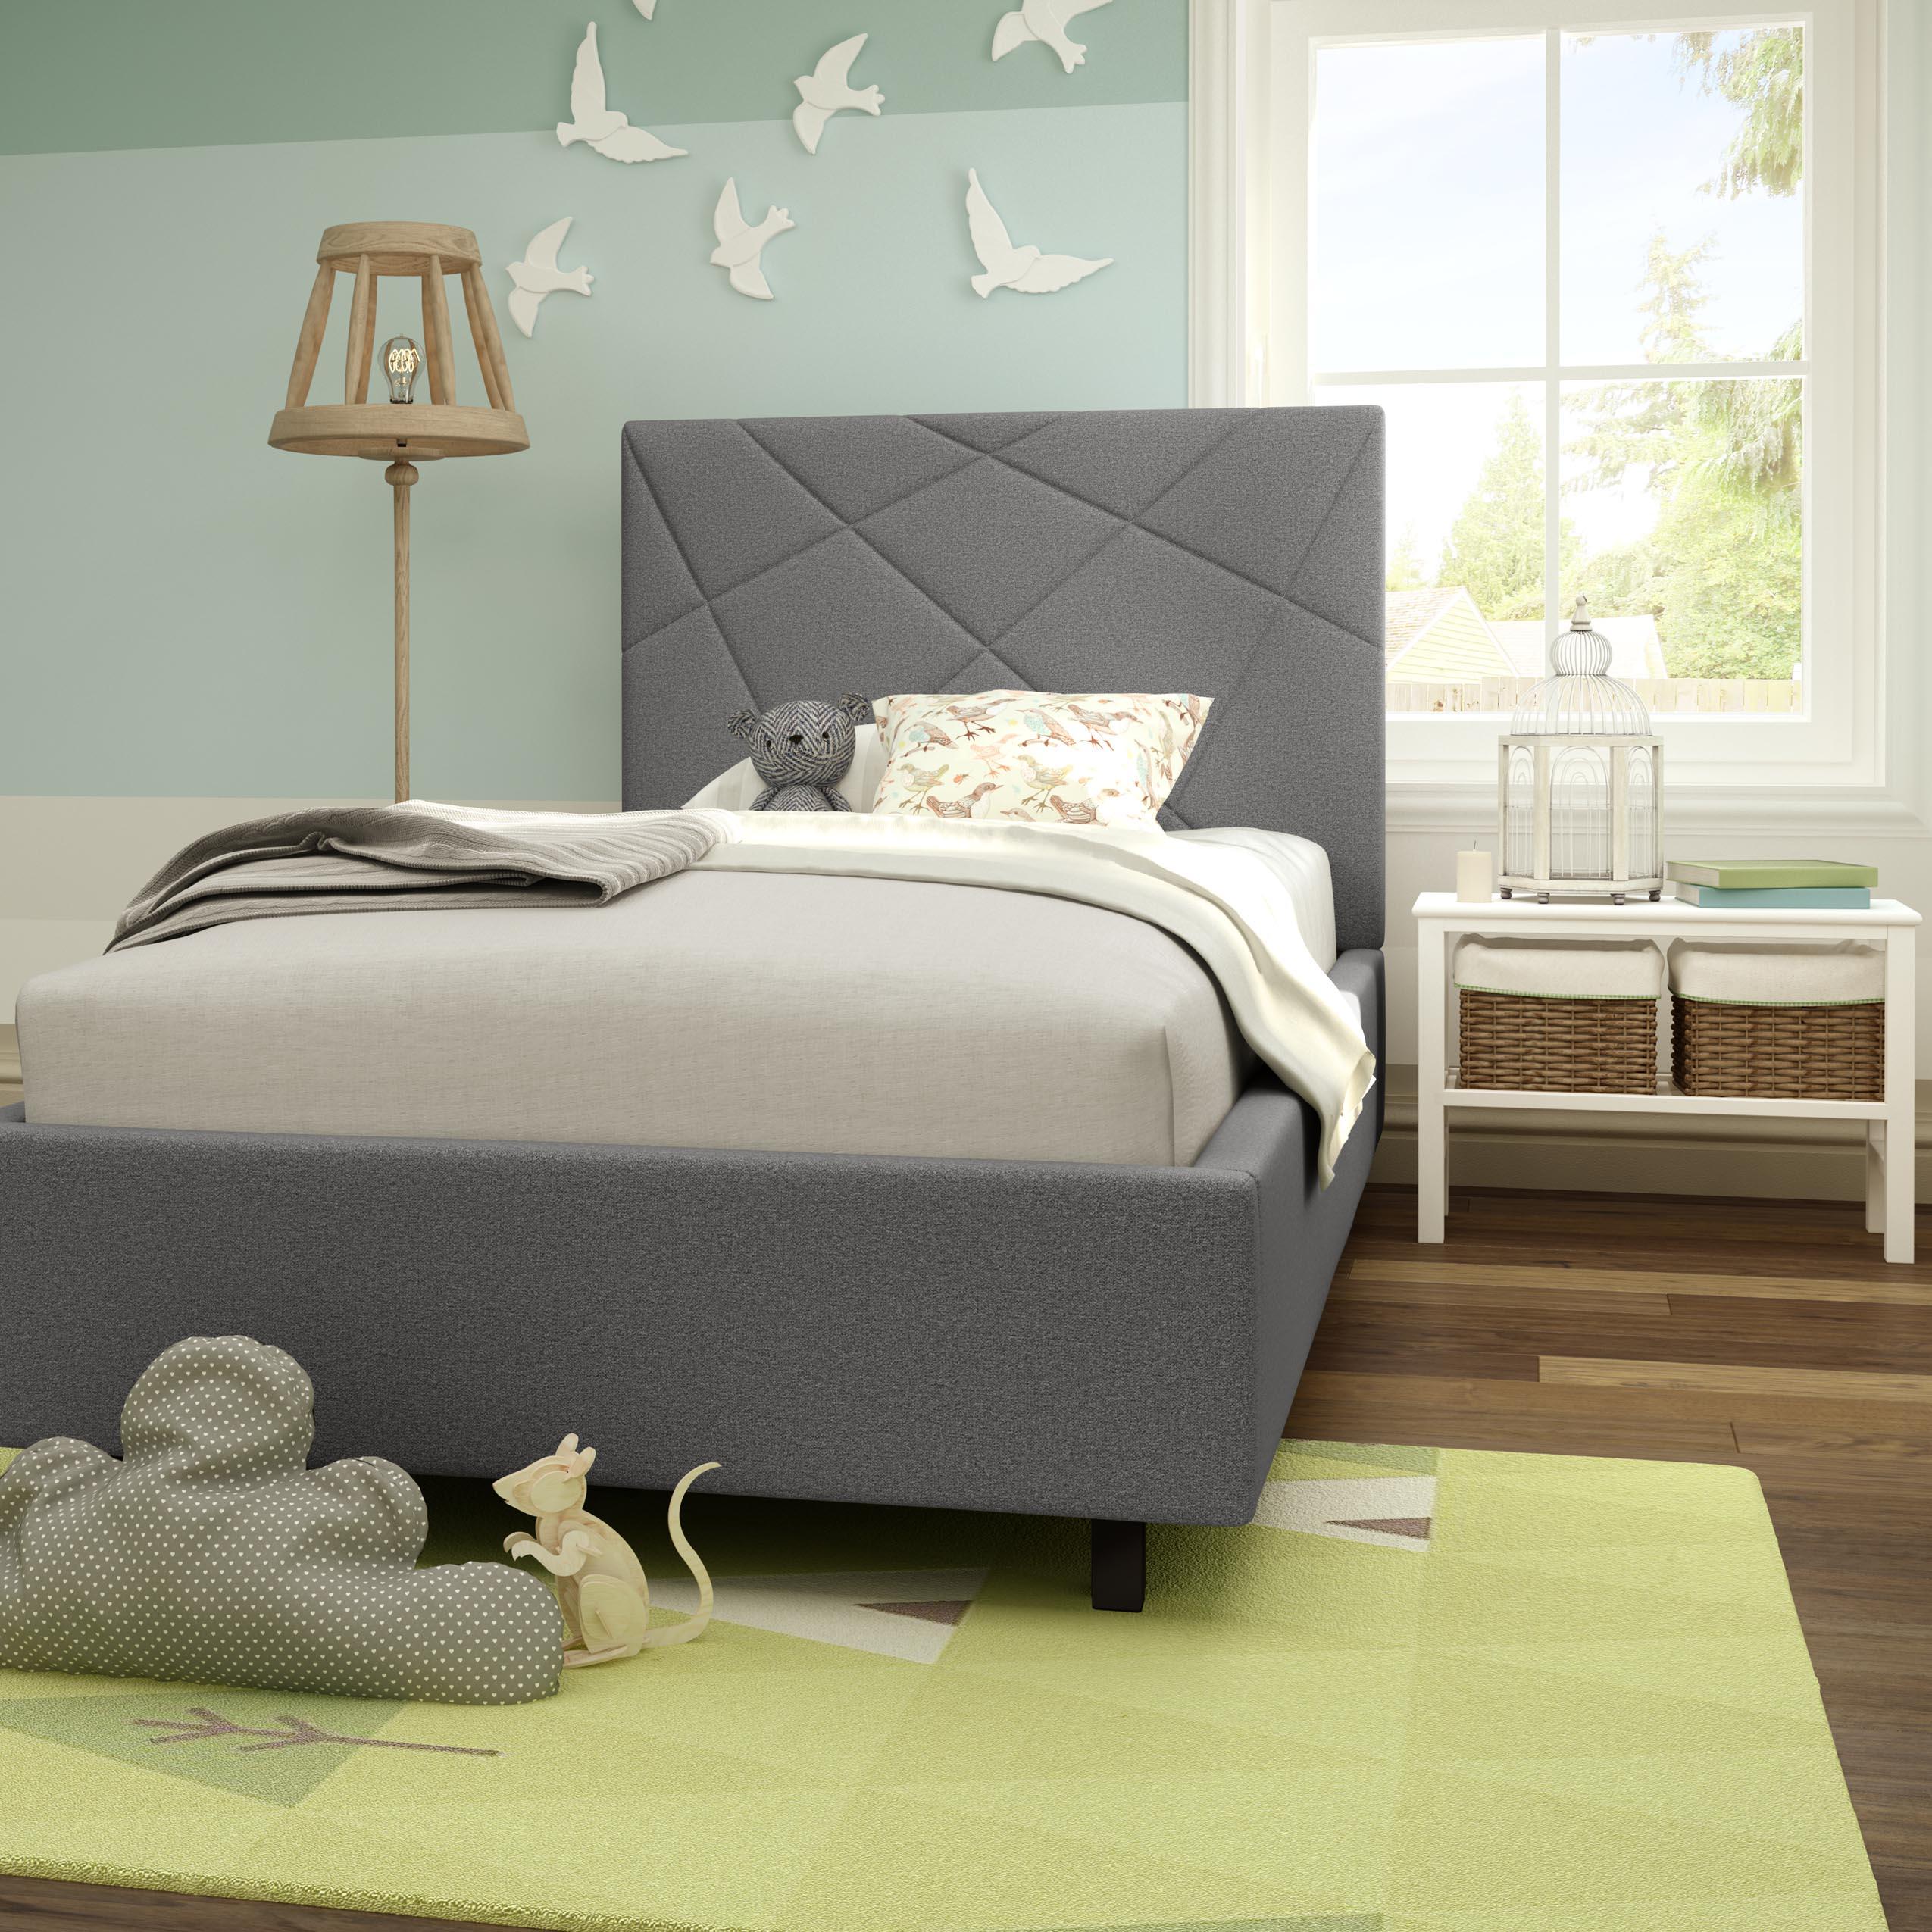 Nanaimo Bed by Amisco